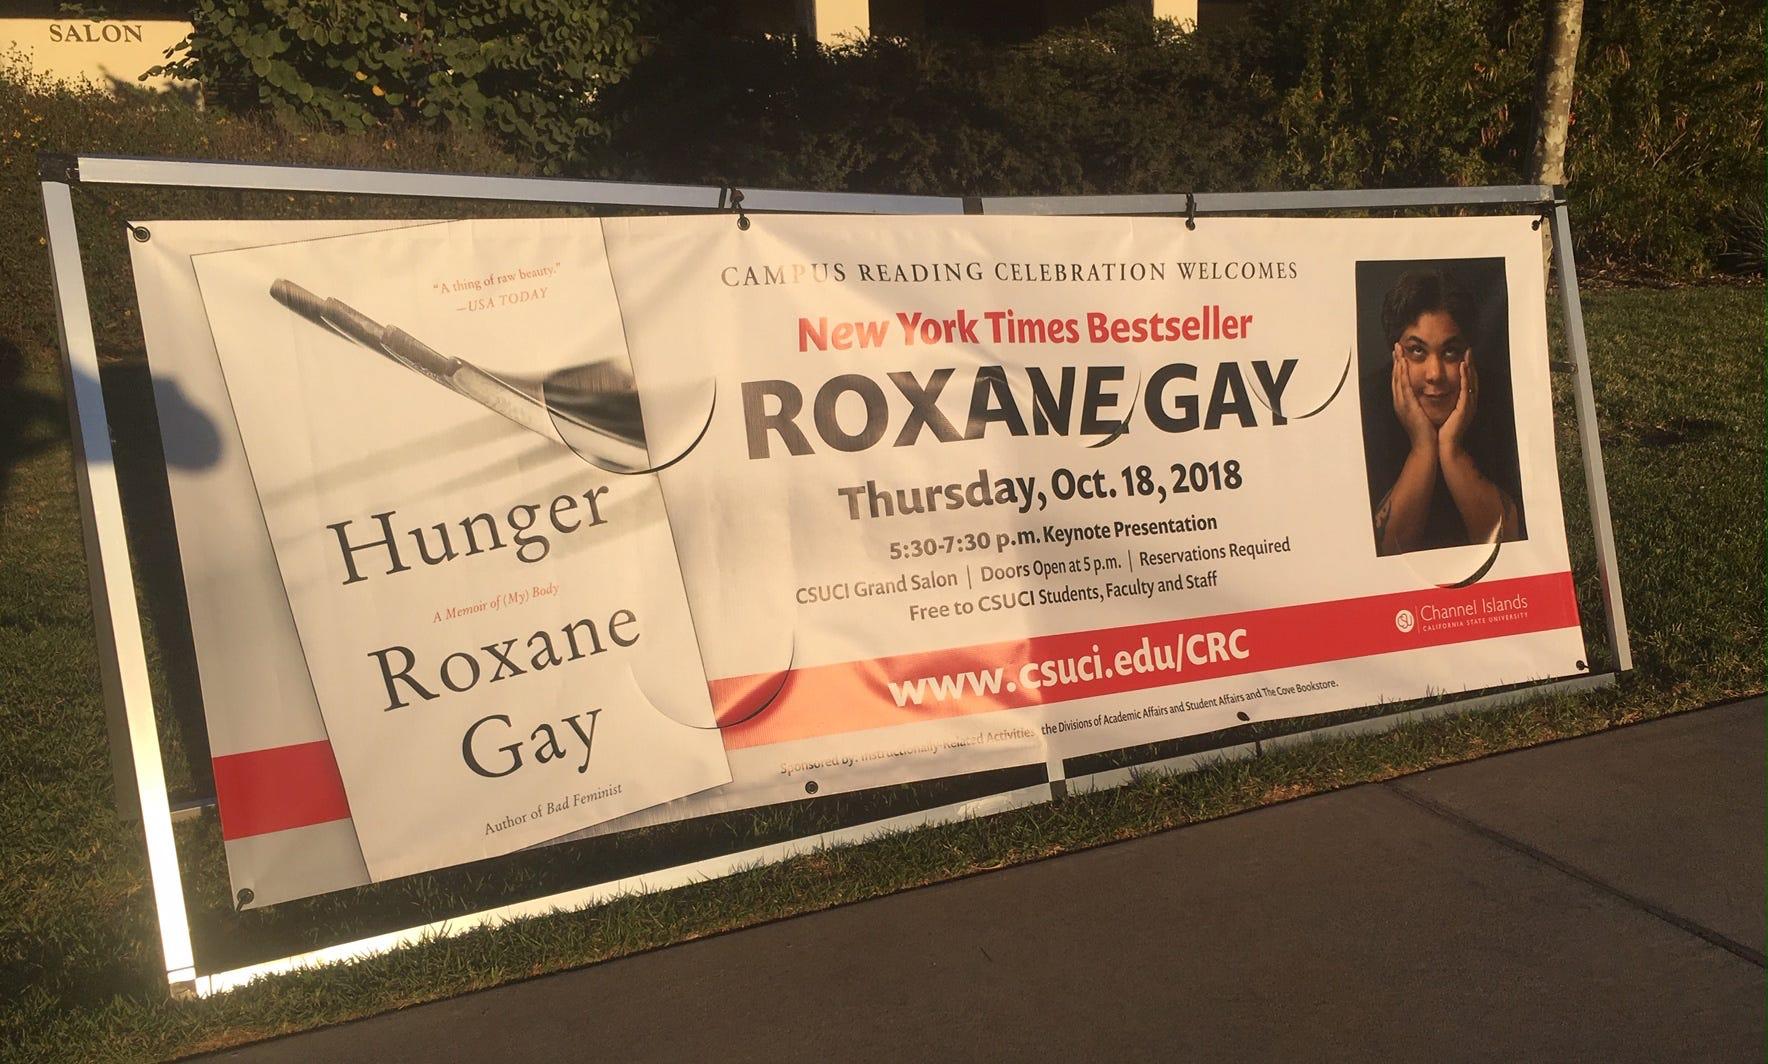 Raw gay free gay